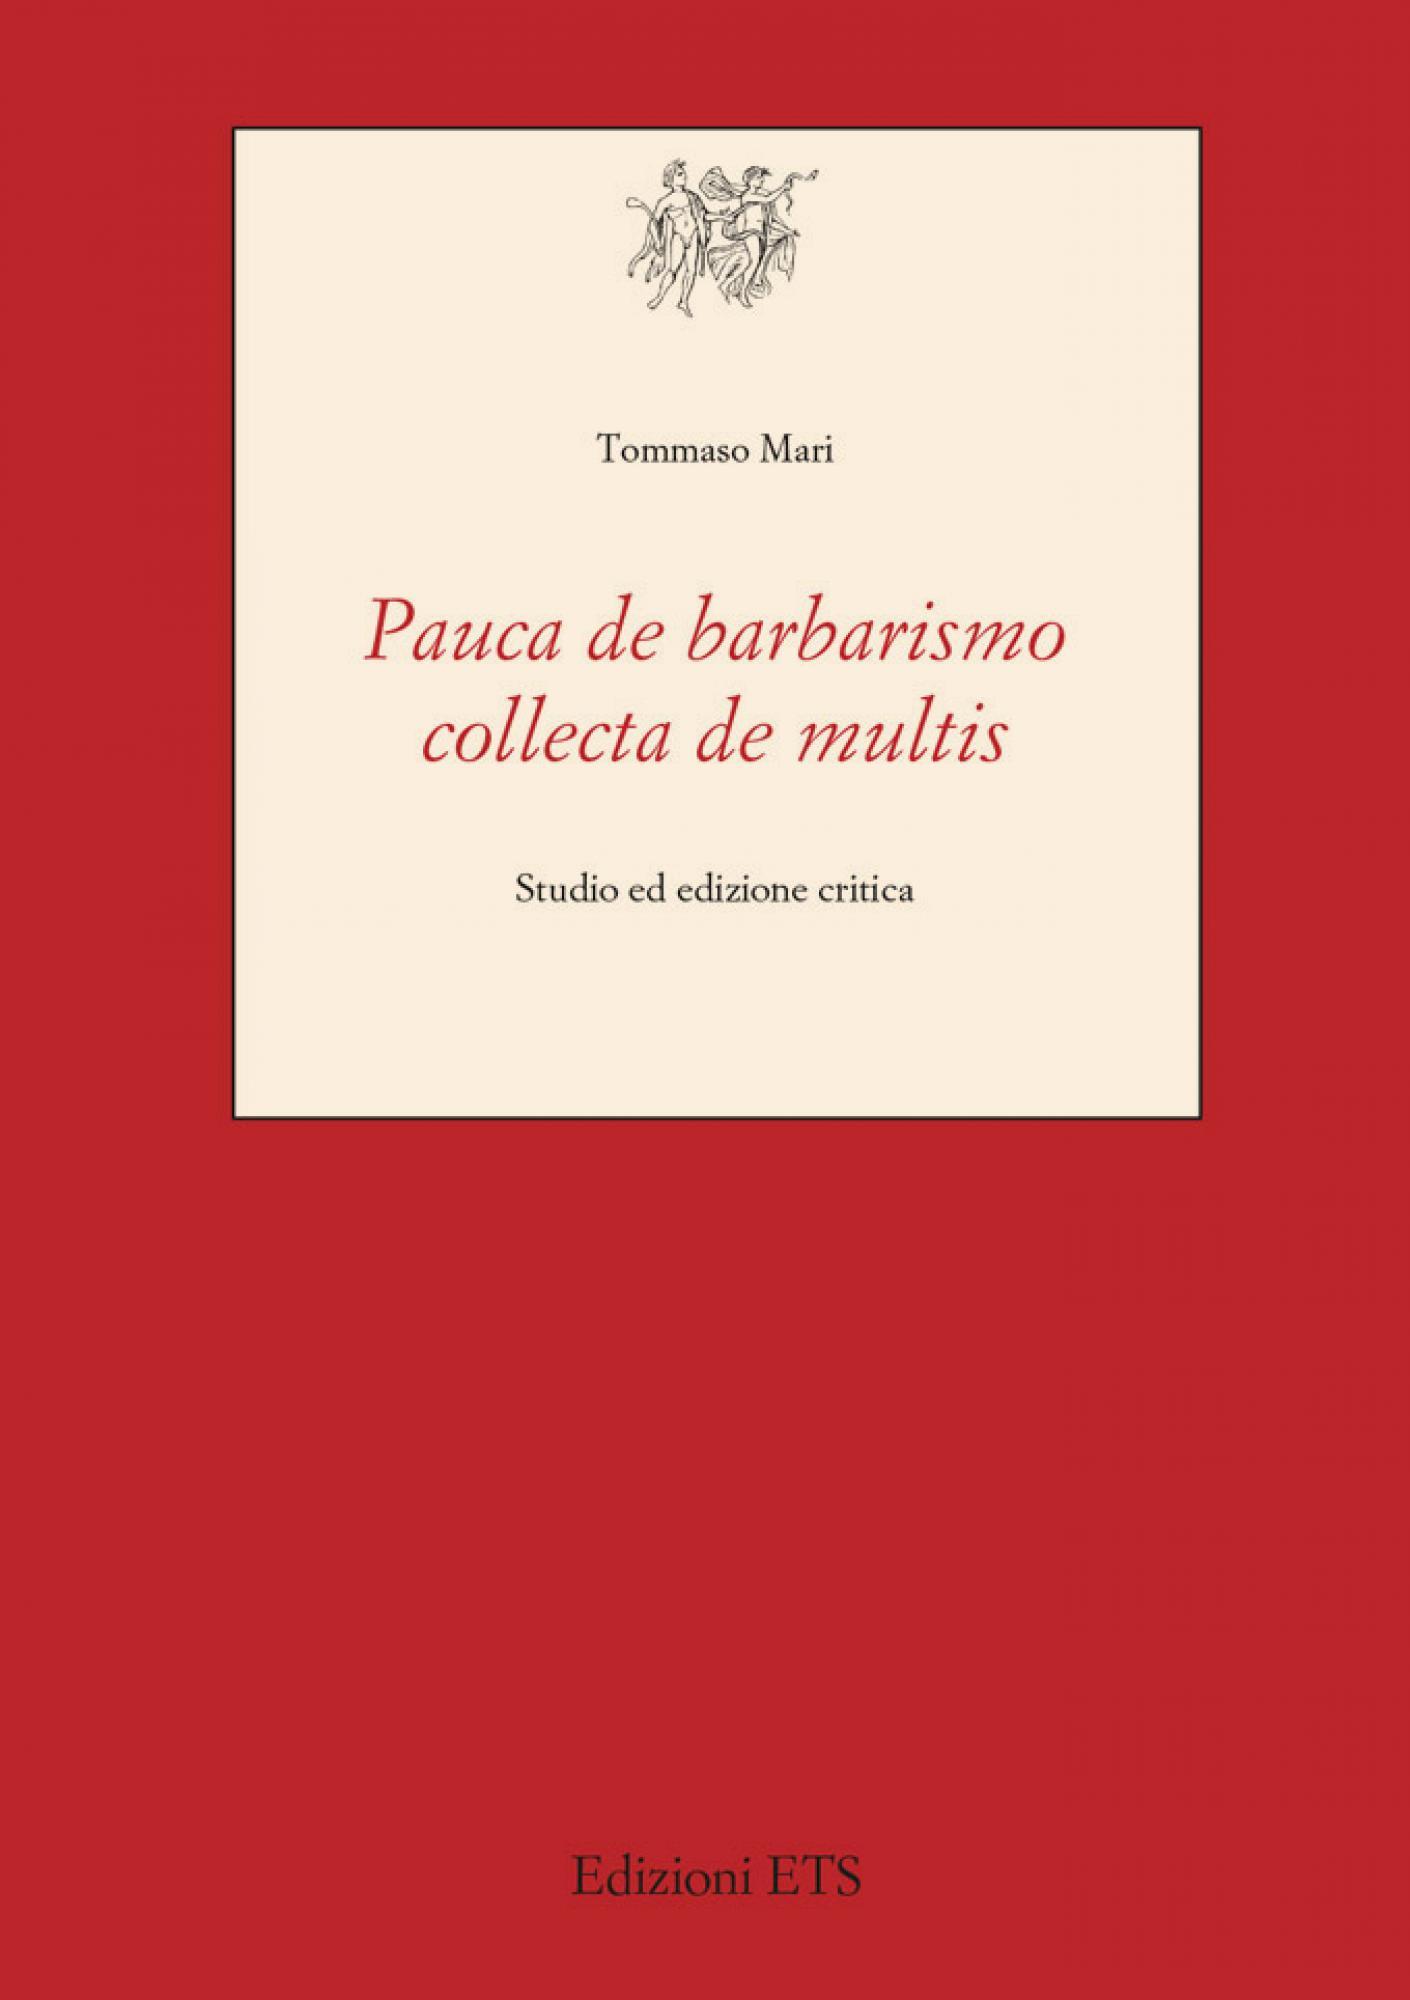 <em>Pauca de barbarismo collecta de multis</em>.Studio ed edizione critica